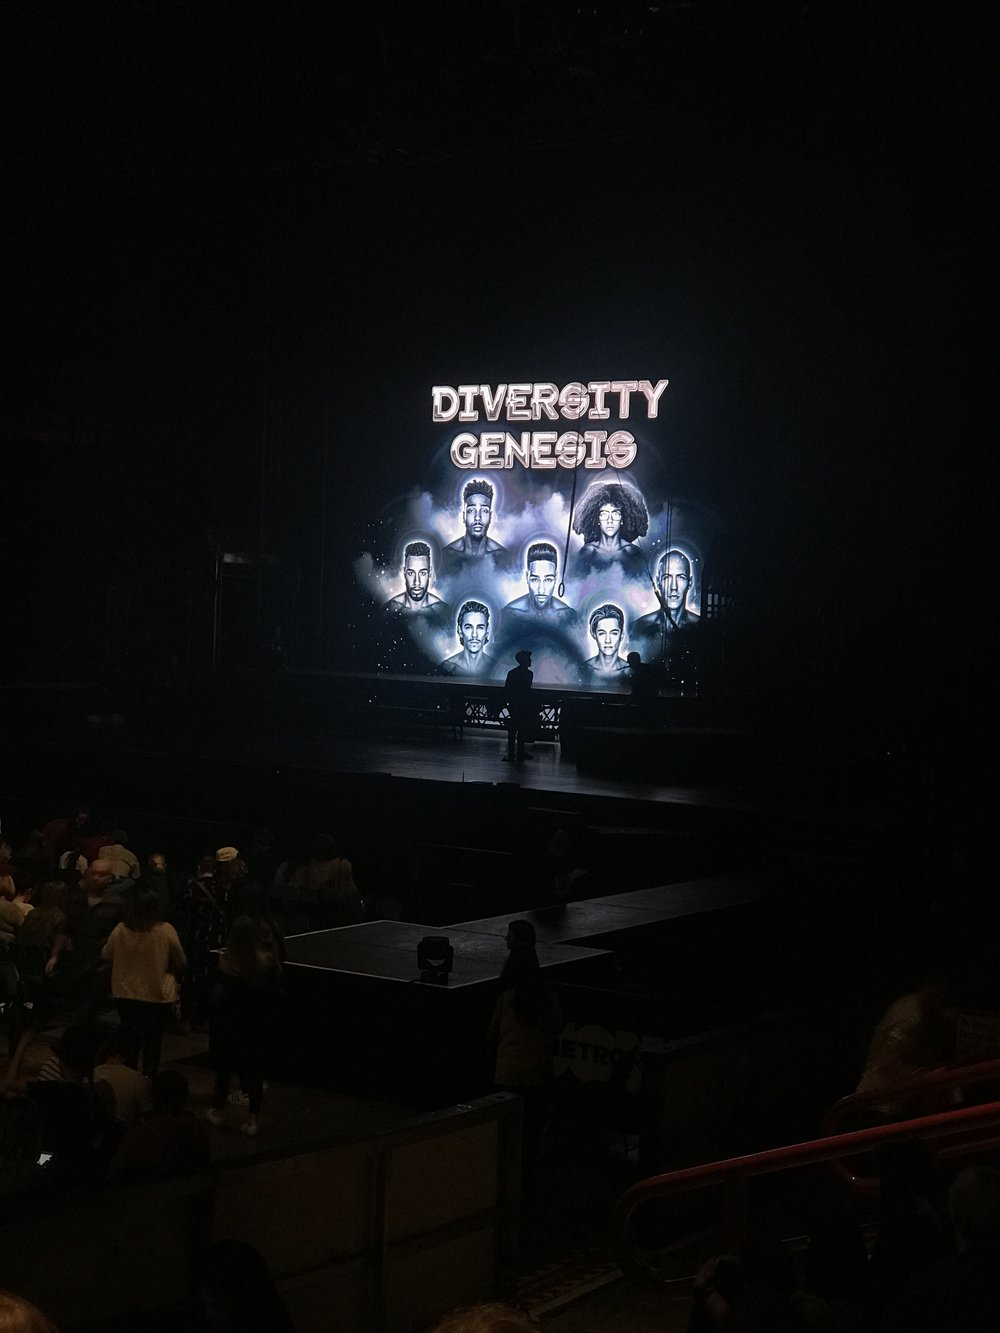 Diversity Genesis Tour | Dance Show | Metro Radio Arena Newcastle | Elle Blonde Luxury Lifestyle Destination Blog